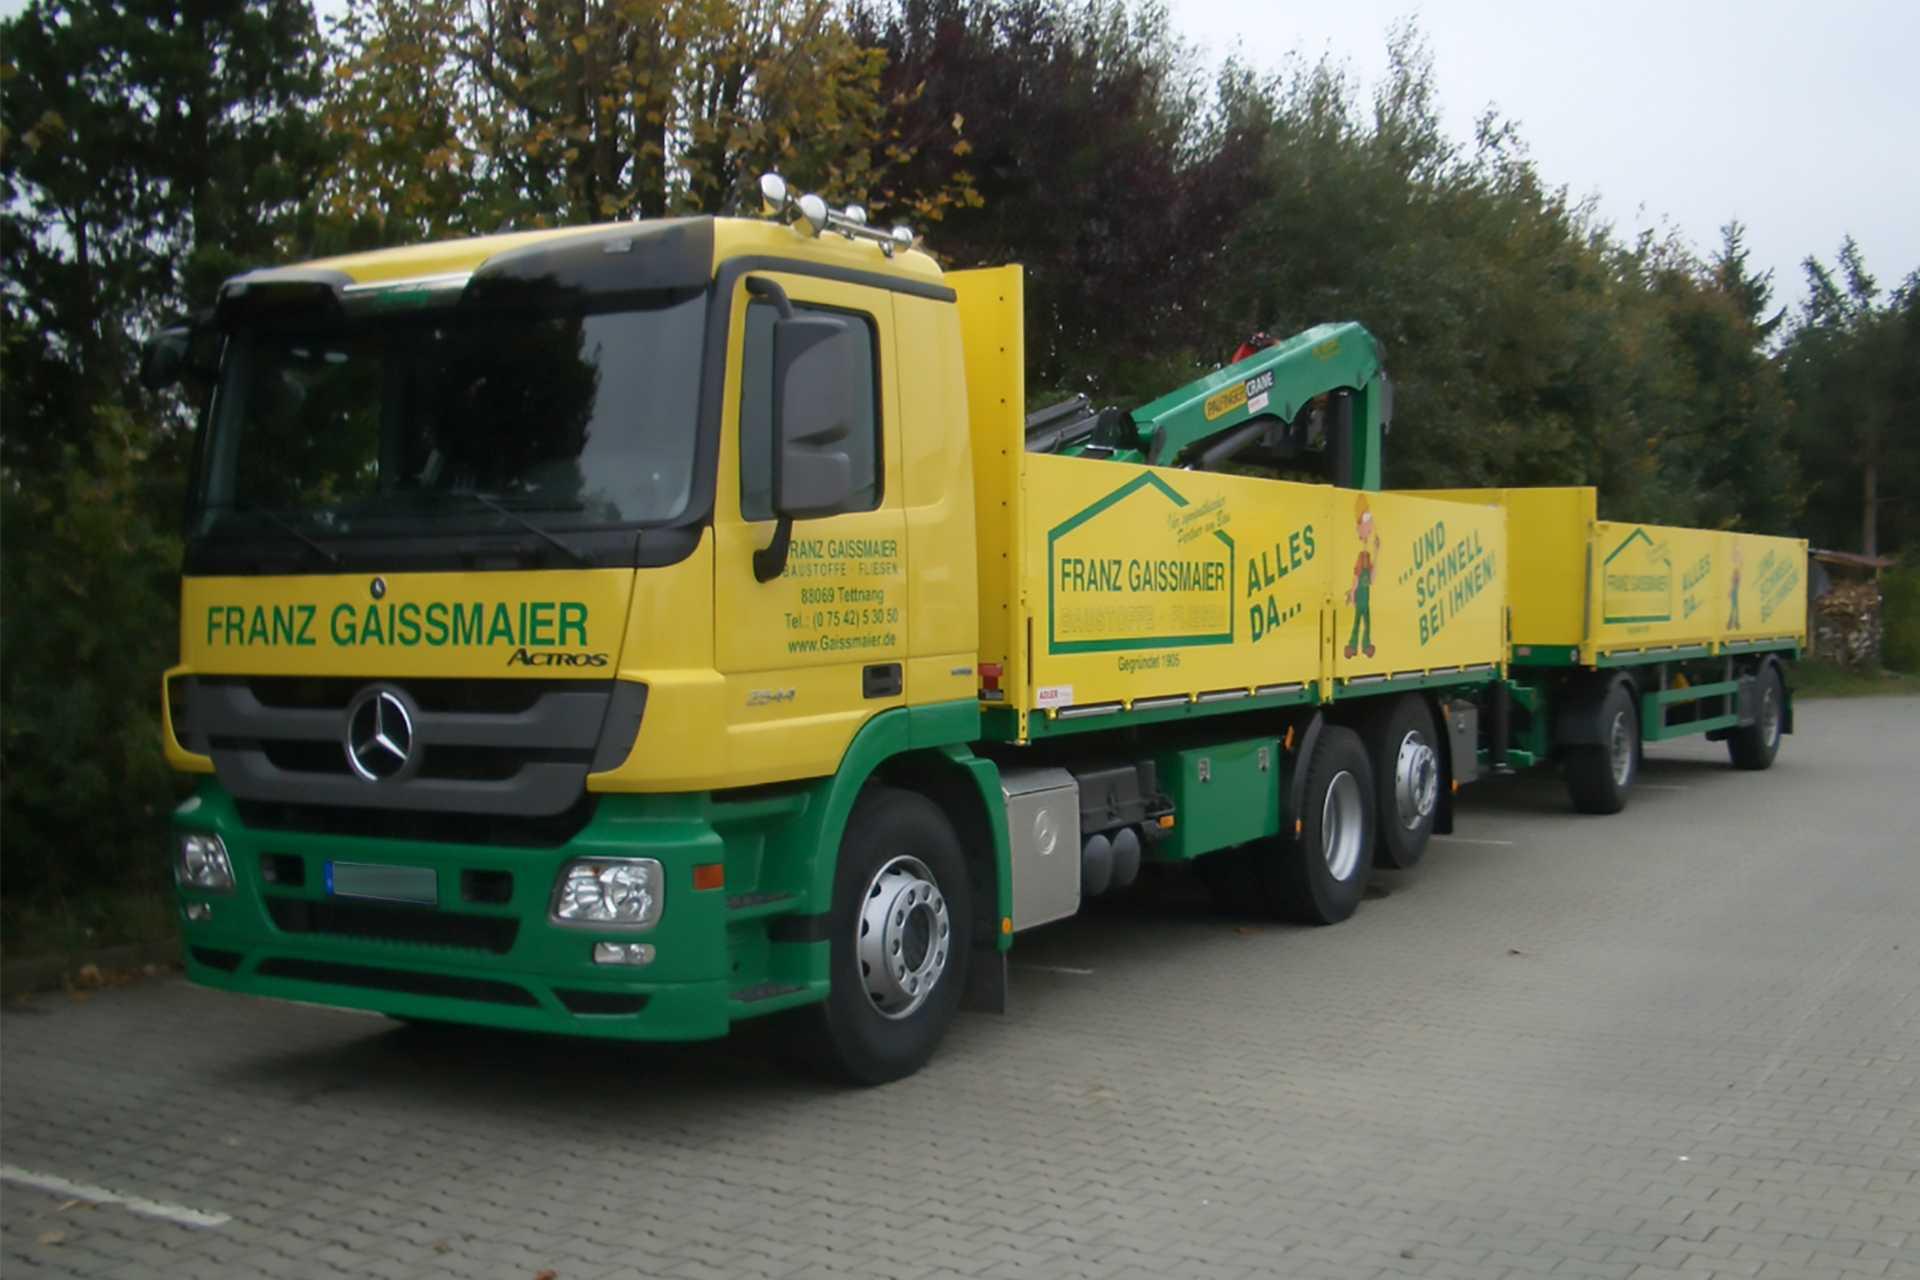 CIMG2304_Ref_Fahrzeug